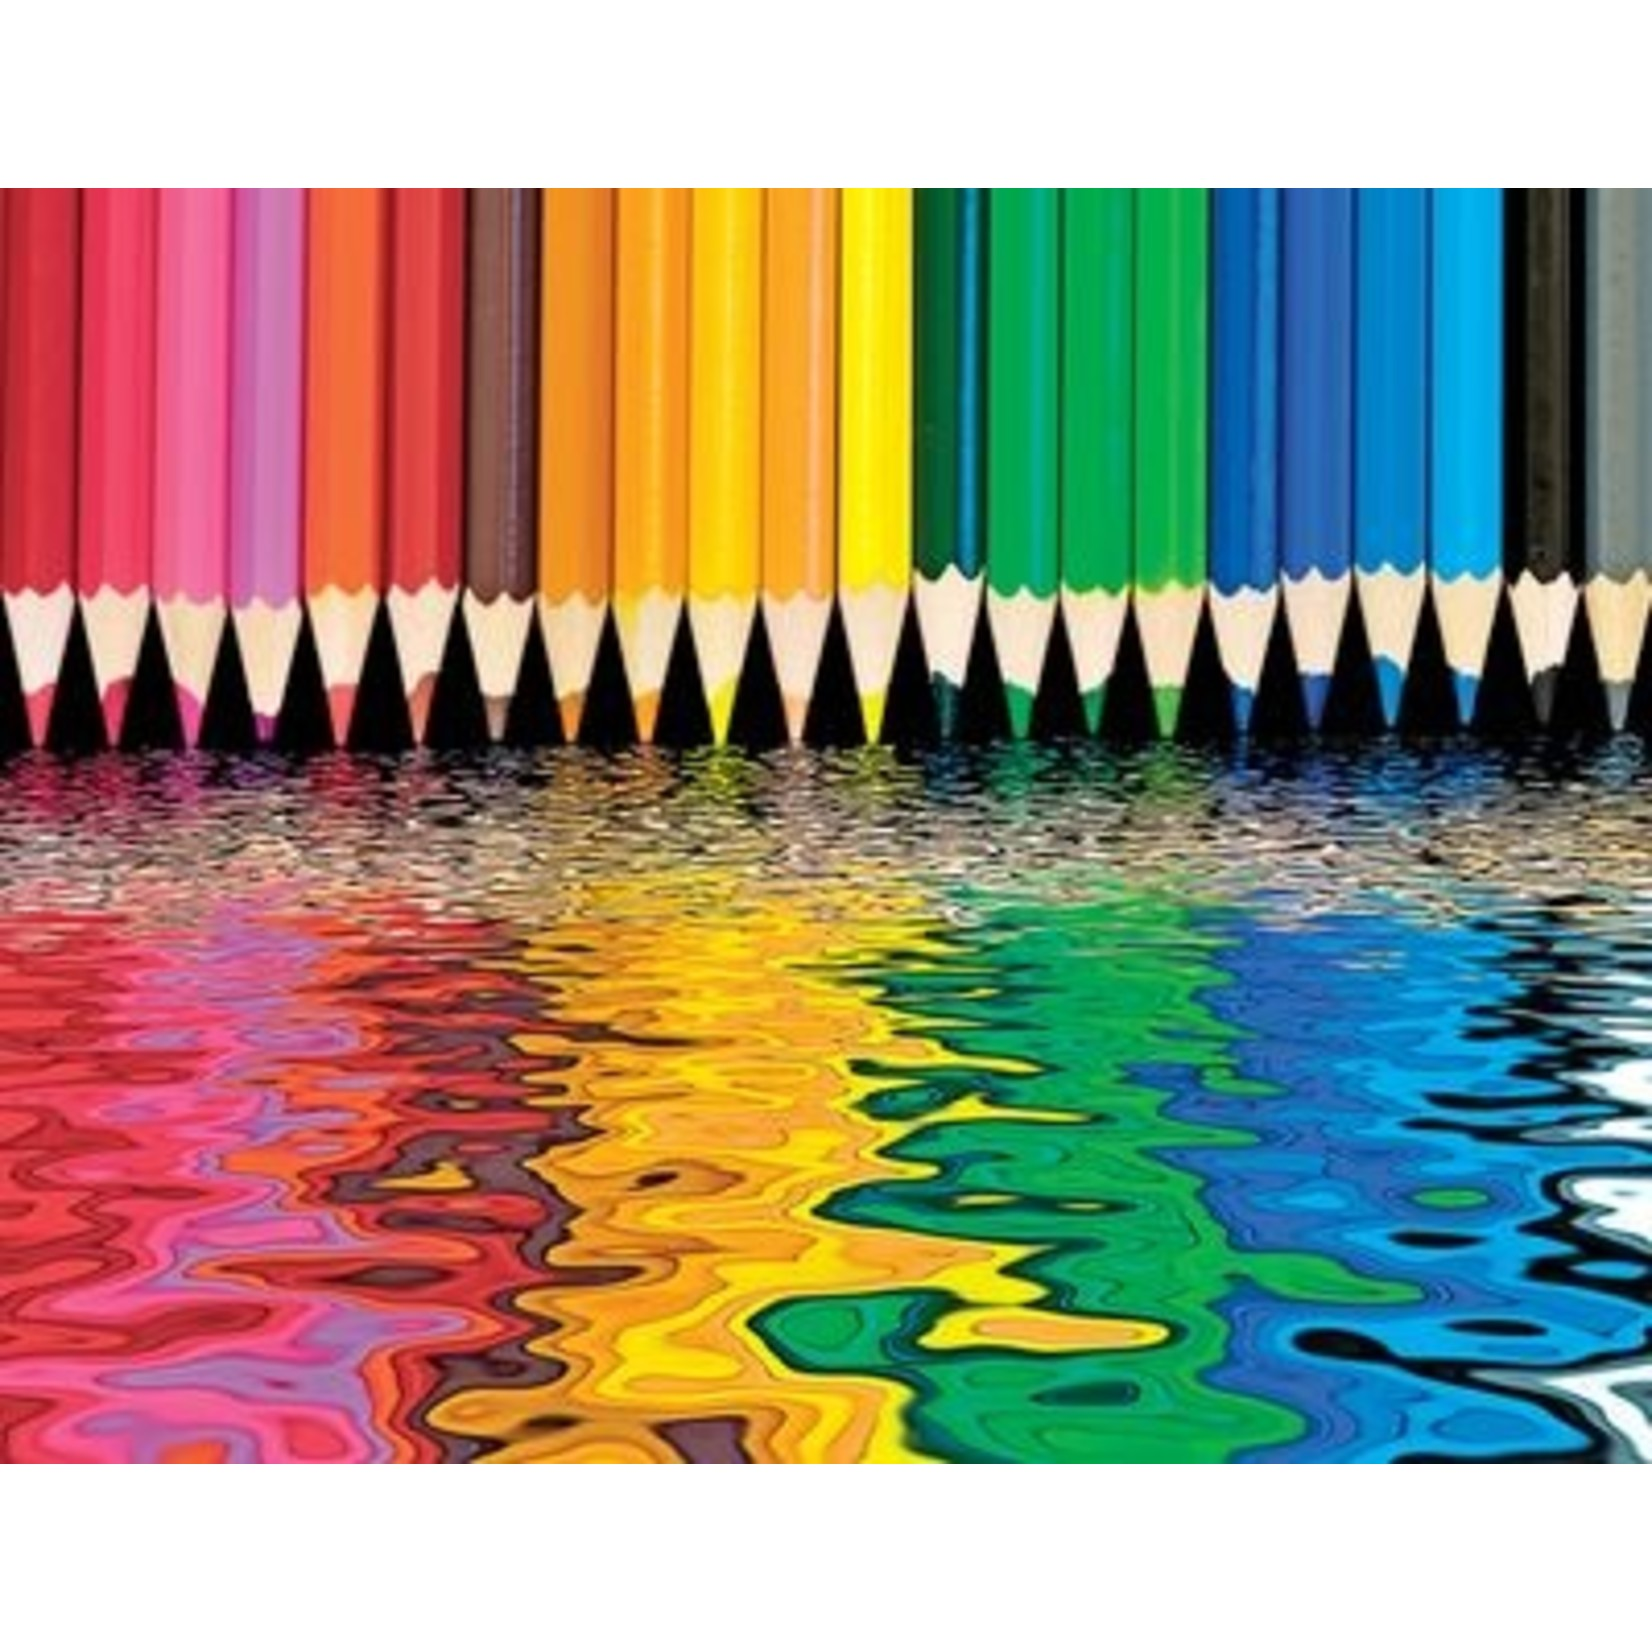 Pencil Pushers 500 Piece Jigsaw Puzzle